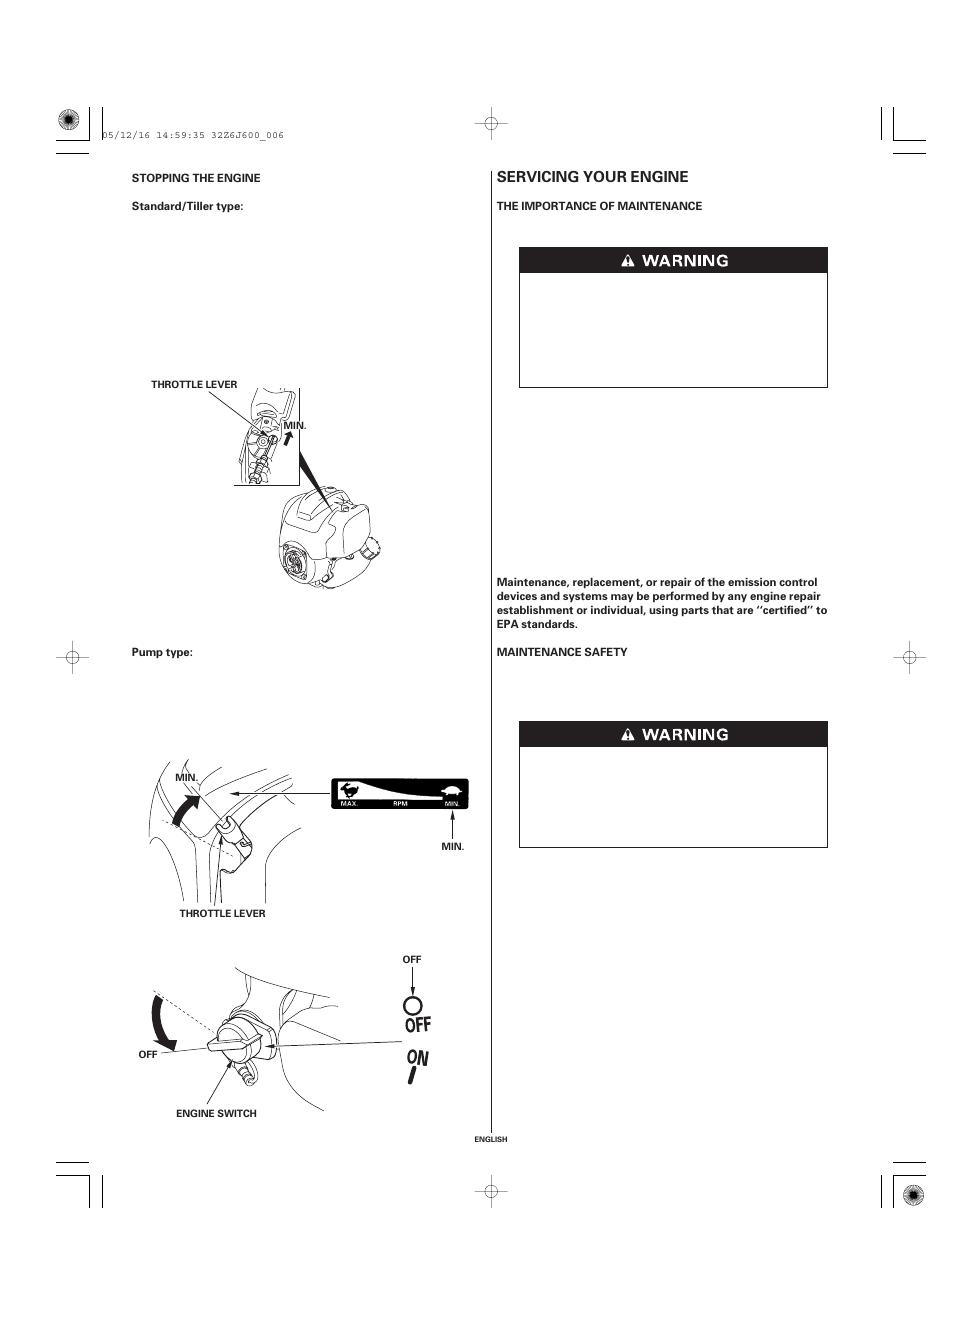 servicing your engine honda gx35 user manual page 6 20 rh manualsdir com honda gx35 manuel francais honda gx35 service manual